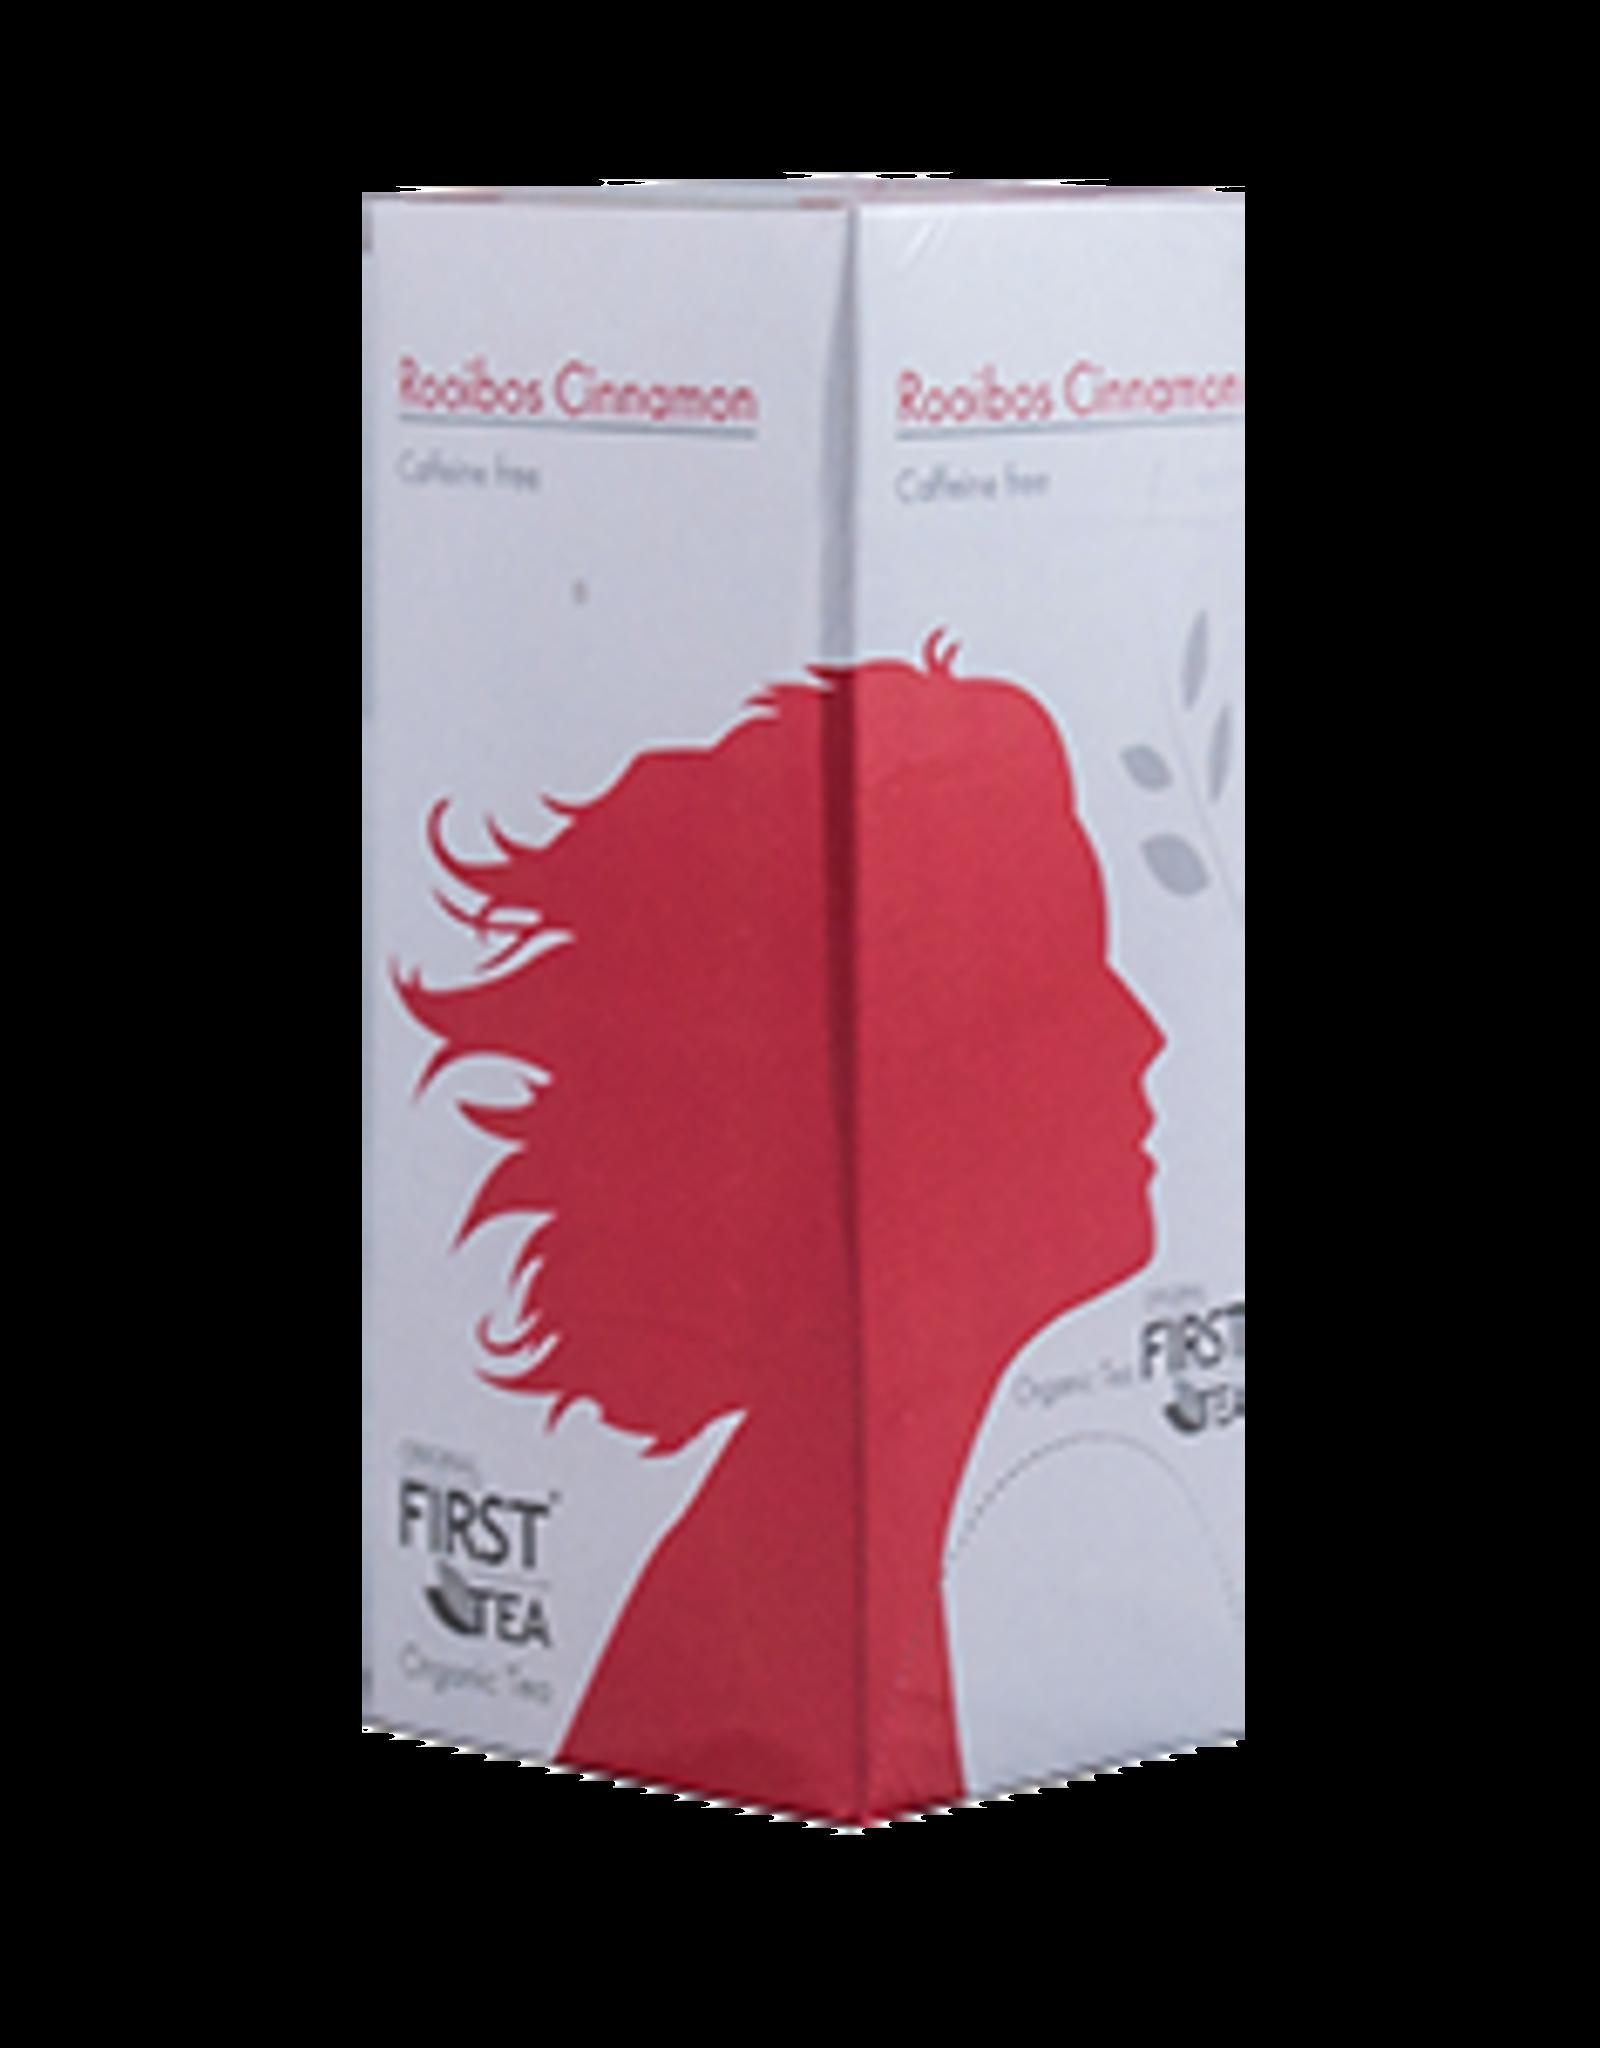 First Tea Premiumline Premium Line Rooibos Cinnamon